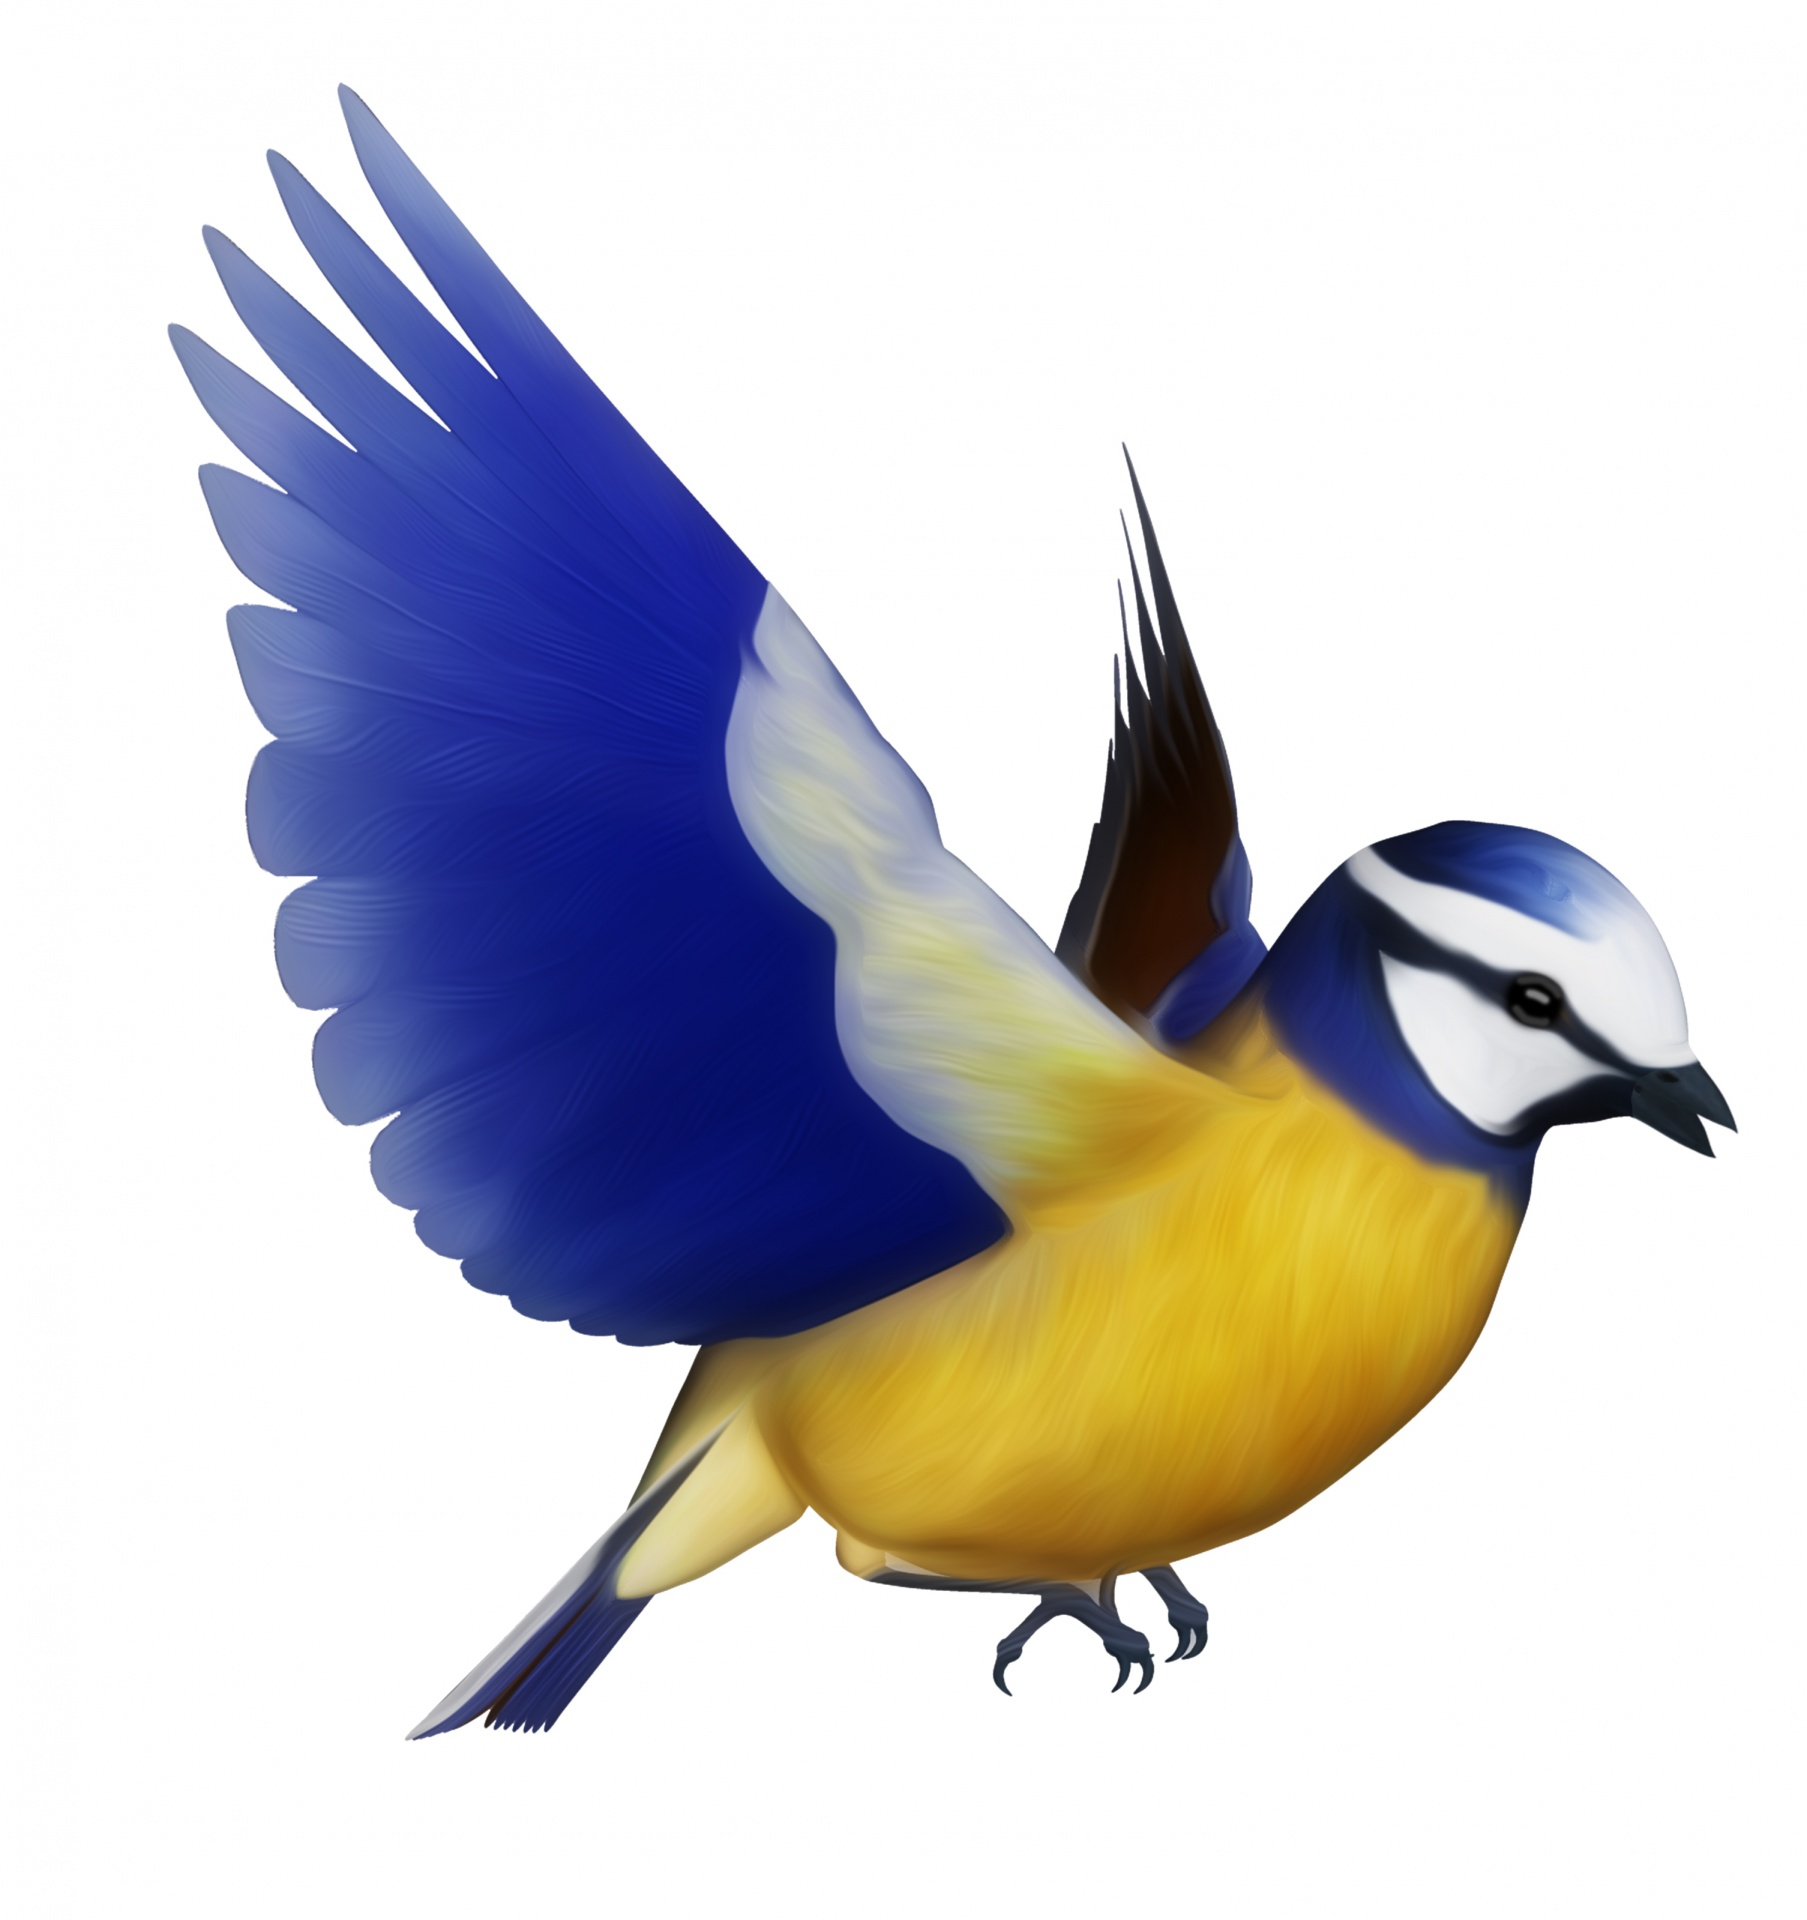 hight resolution of 1807x1920 jay clipart small bird